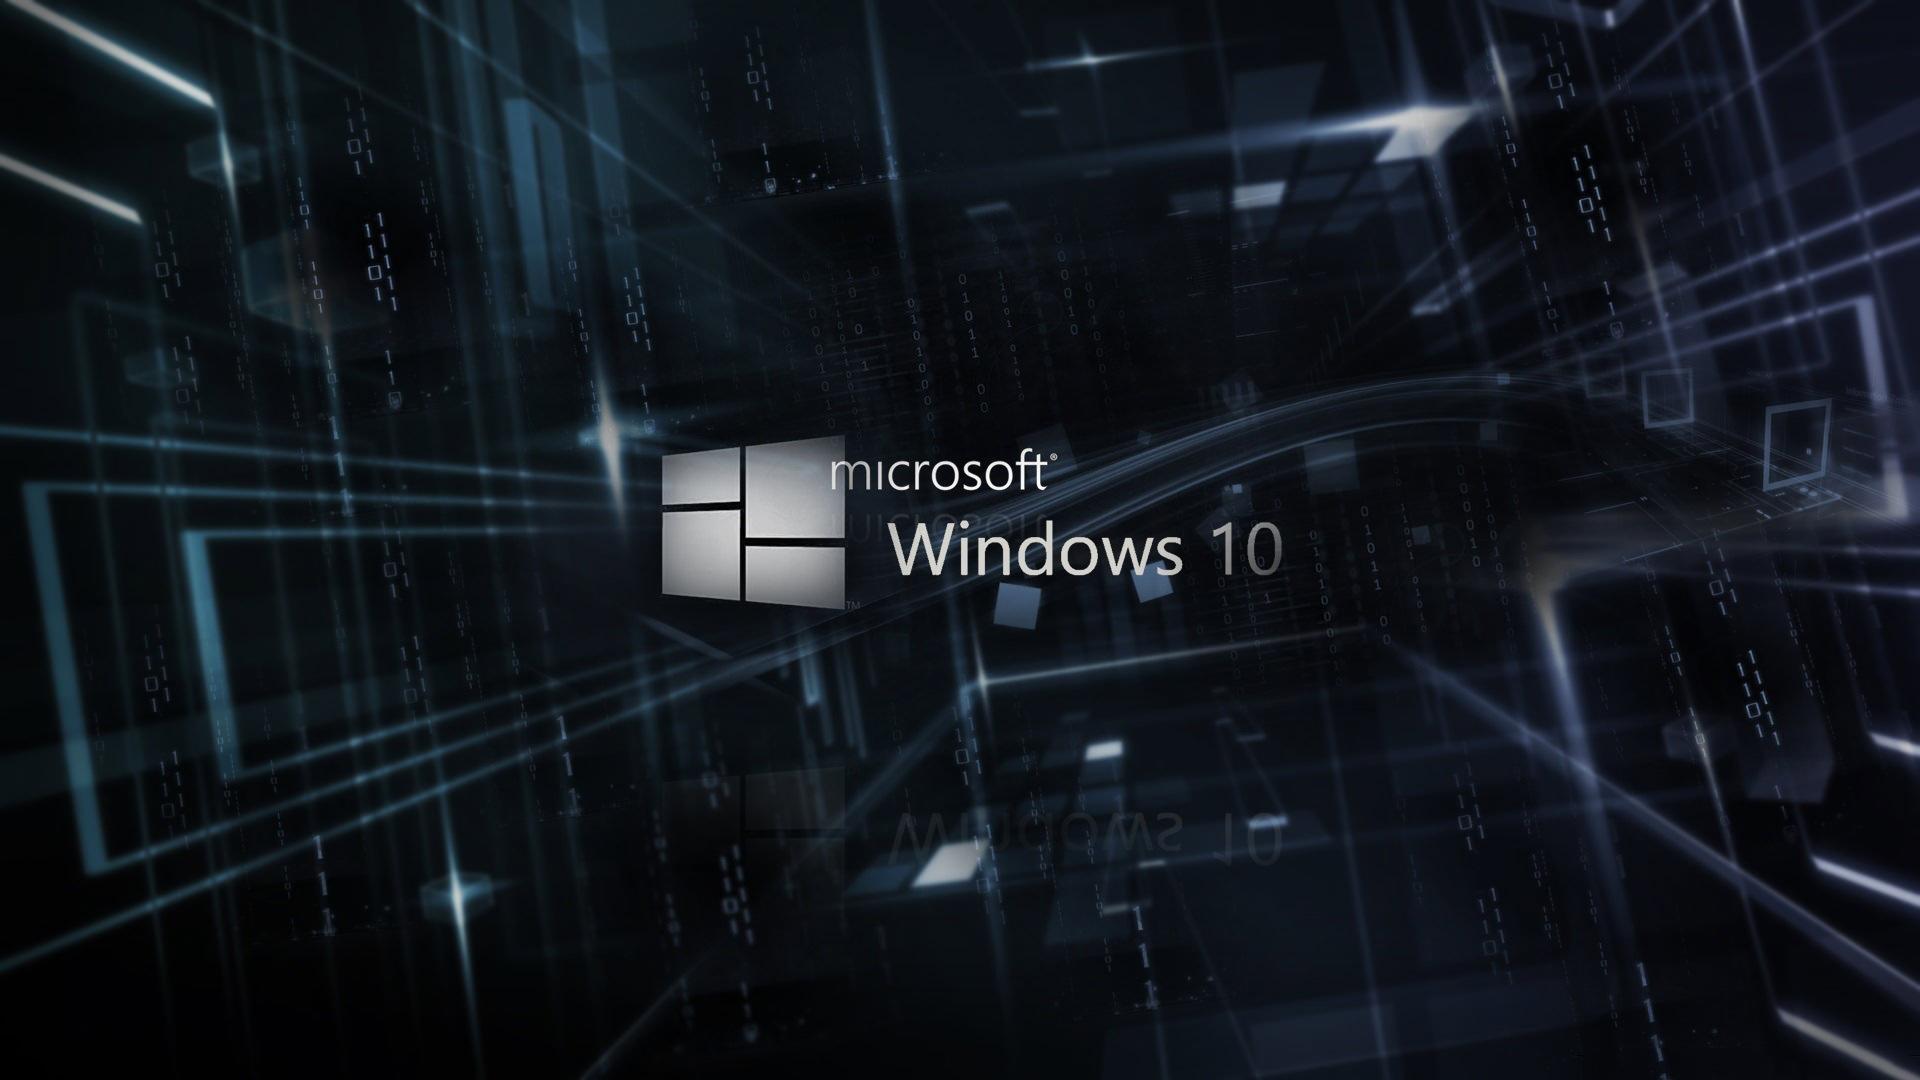 New Hd Wallpapers For Pc Free Download Dark Windows 10 Wallpaper Hd Pics Supportive Guru